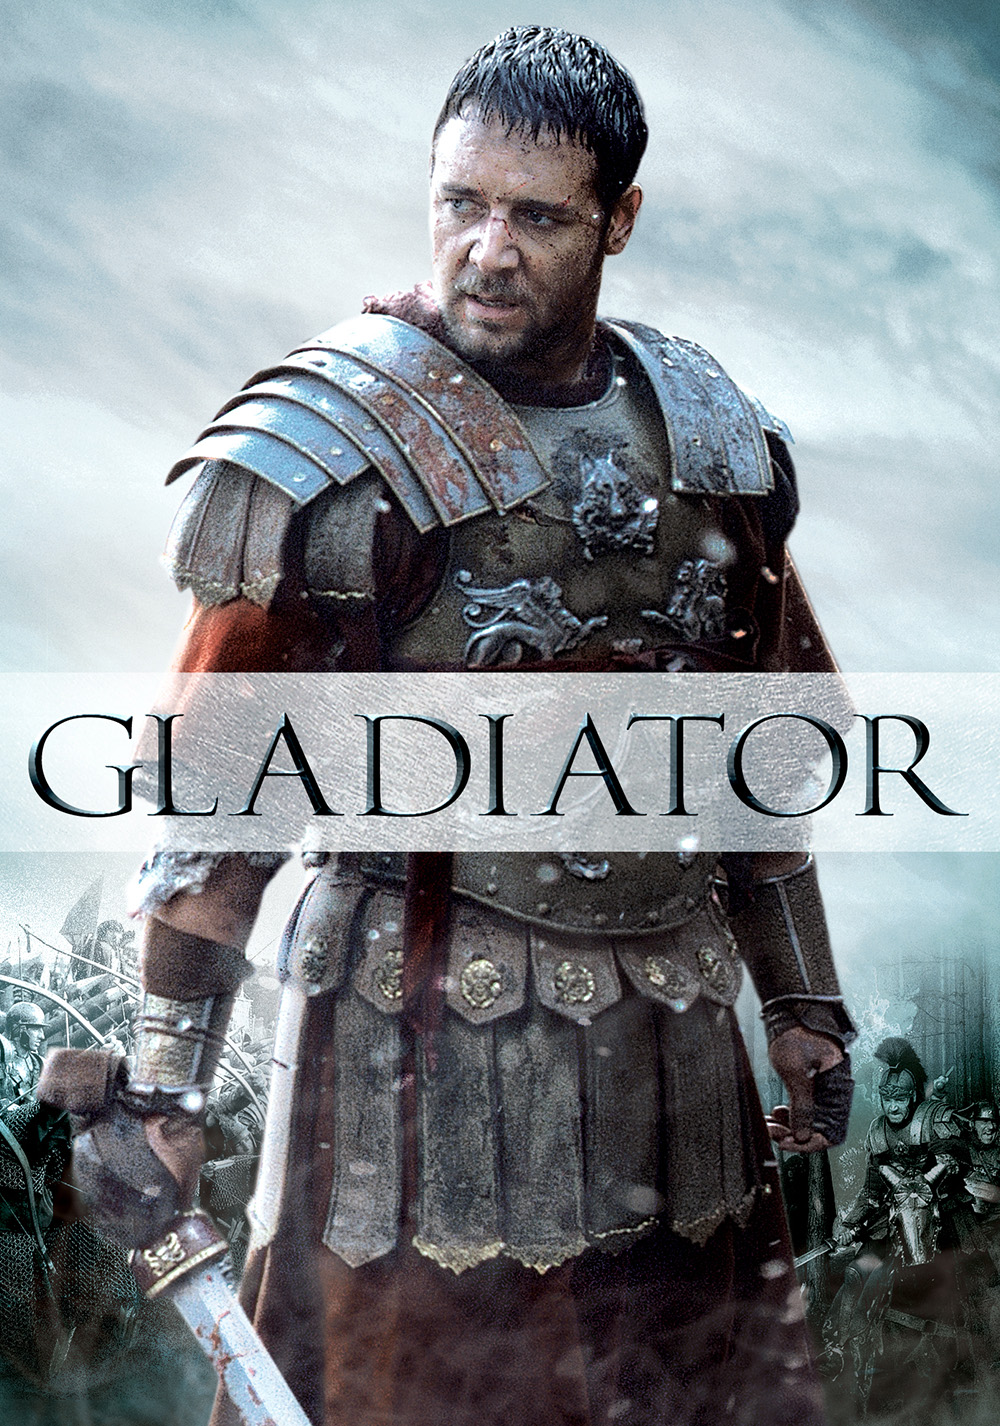 Gladiator แกลดดิเอเตอร์ นักรบผู้กล้า ผ่าแผ่นดินทรราช